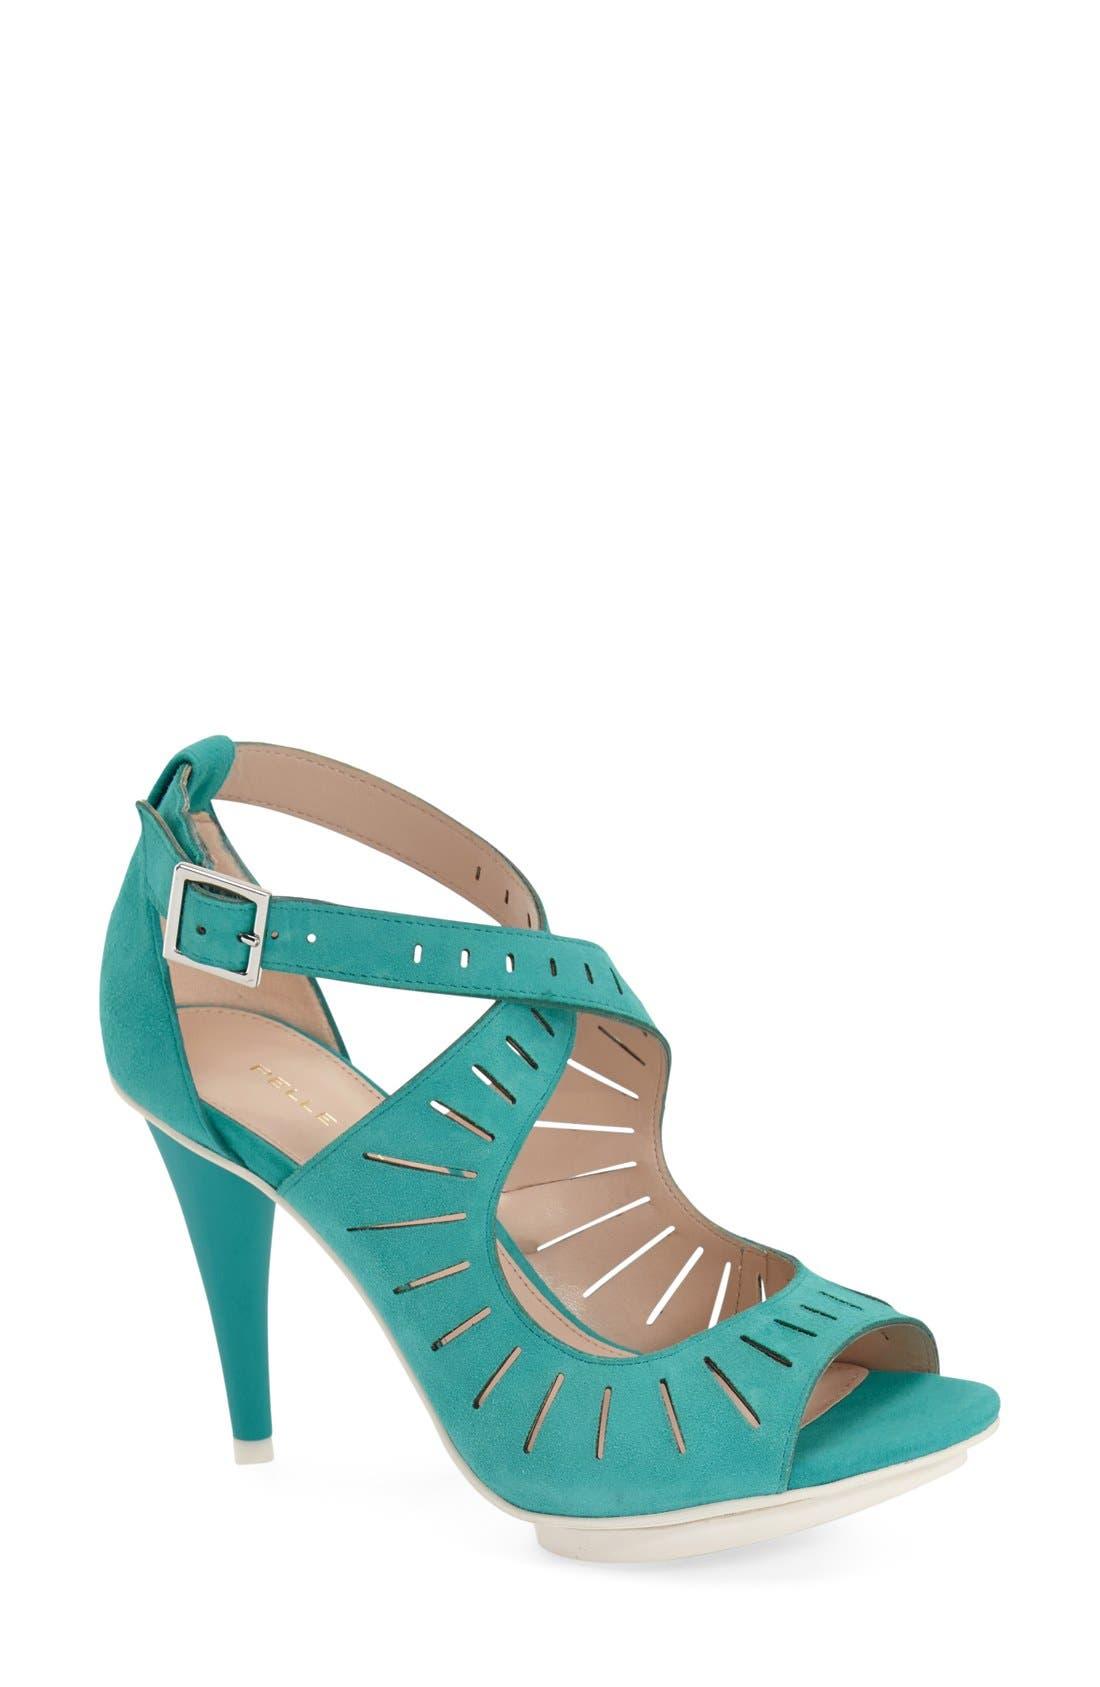 Main Image - Pelle Moda 'Menlo' Cutout Sandal (Women)